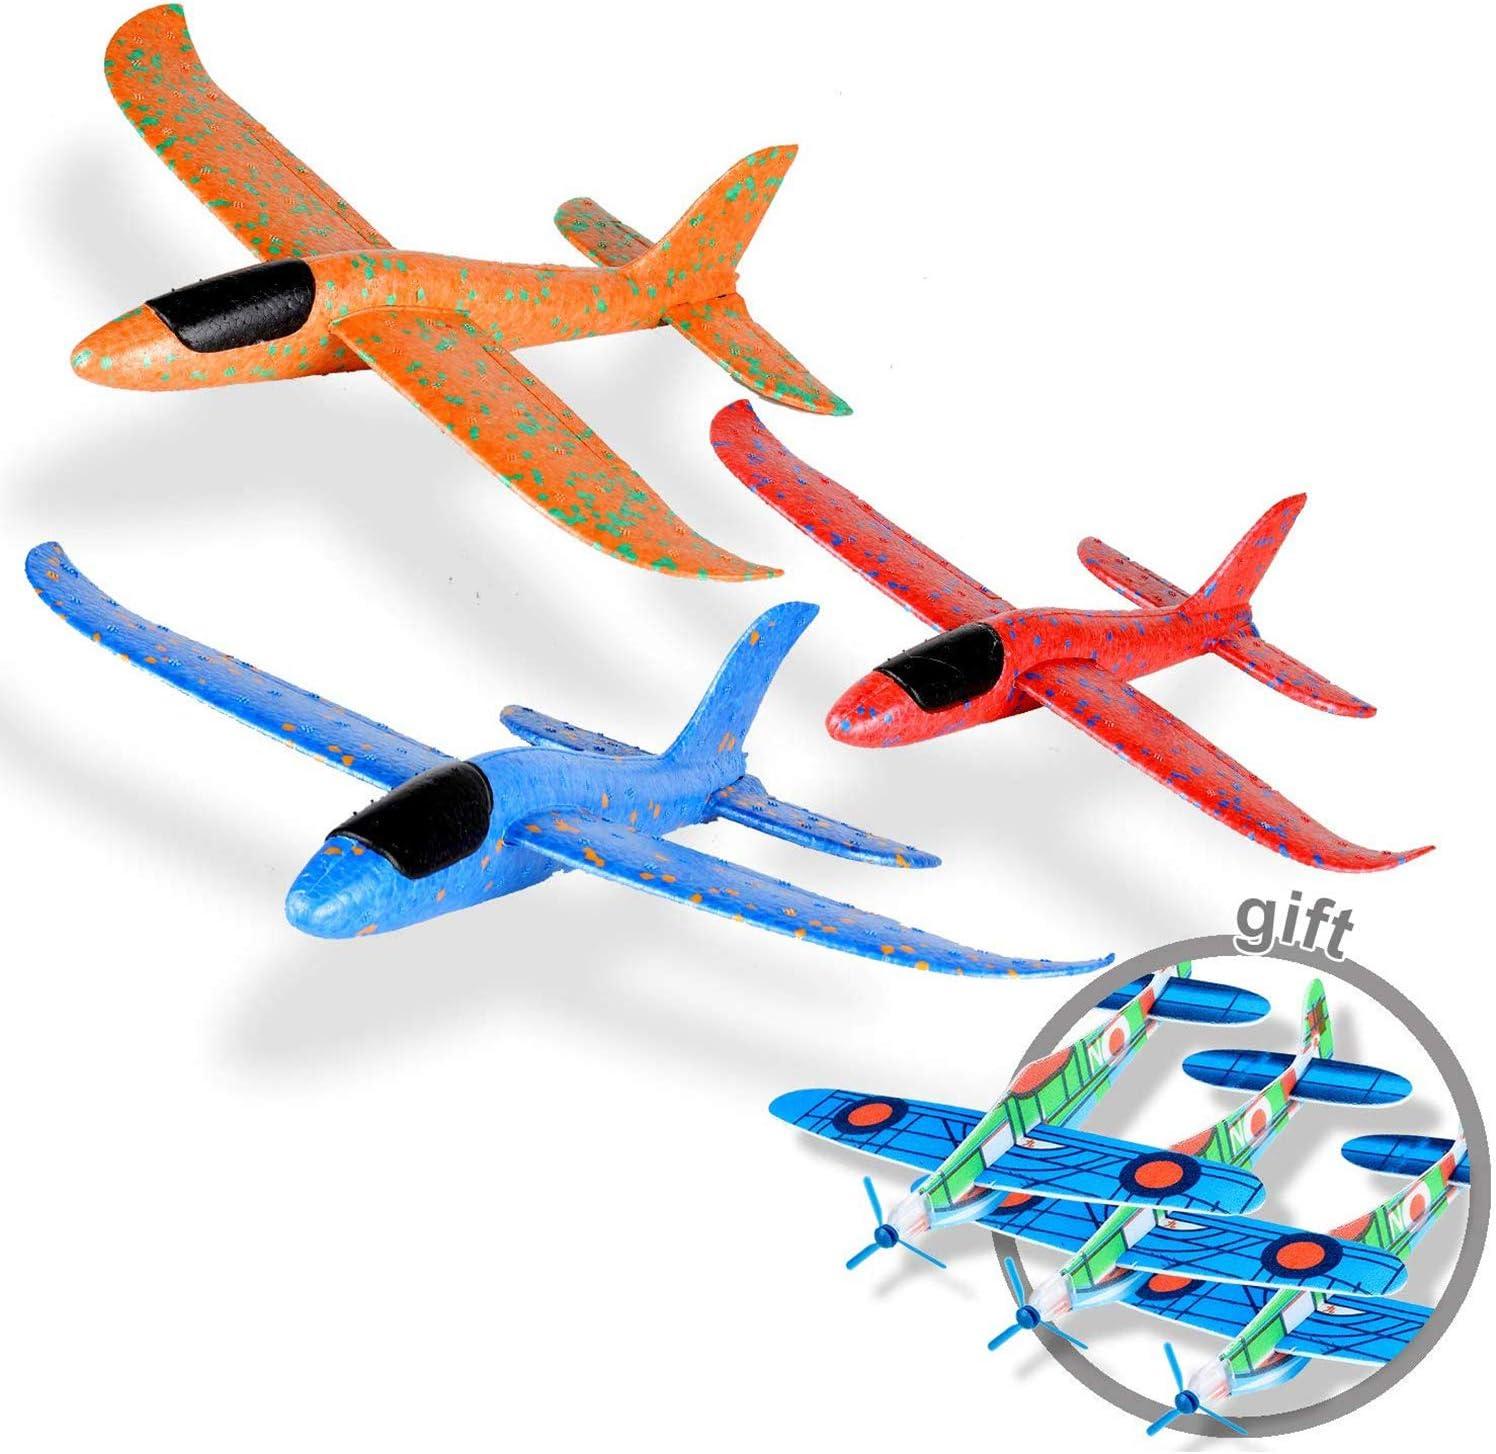 Ulikey 3 Pcs Planos de Espuma, Avión Planeador, Modelo de Avion Deportes al Aire Libre Volar Juguete, Favores de la Fiesta (Naranja, Azul, Rosa)